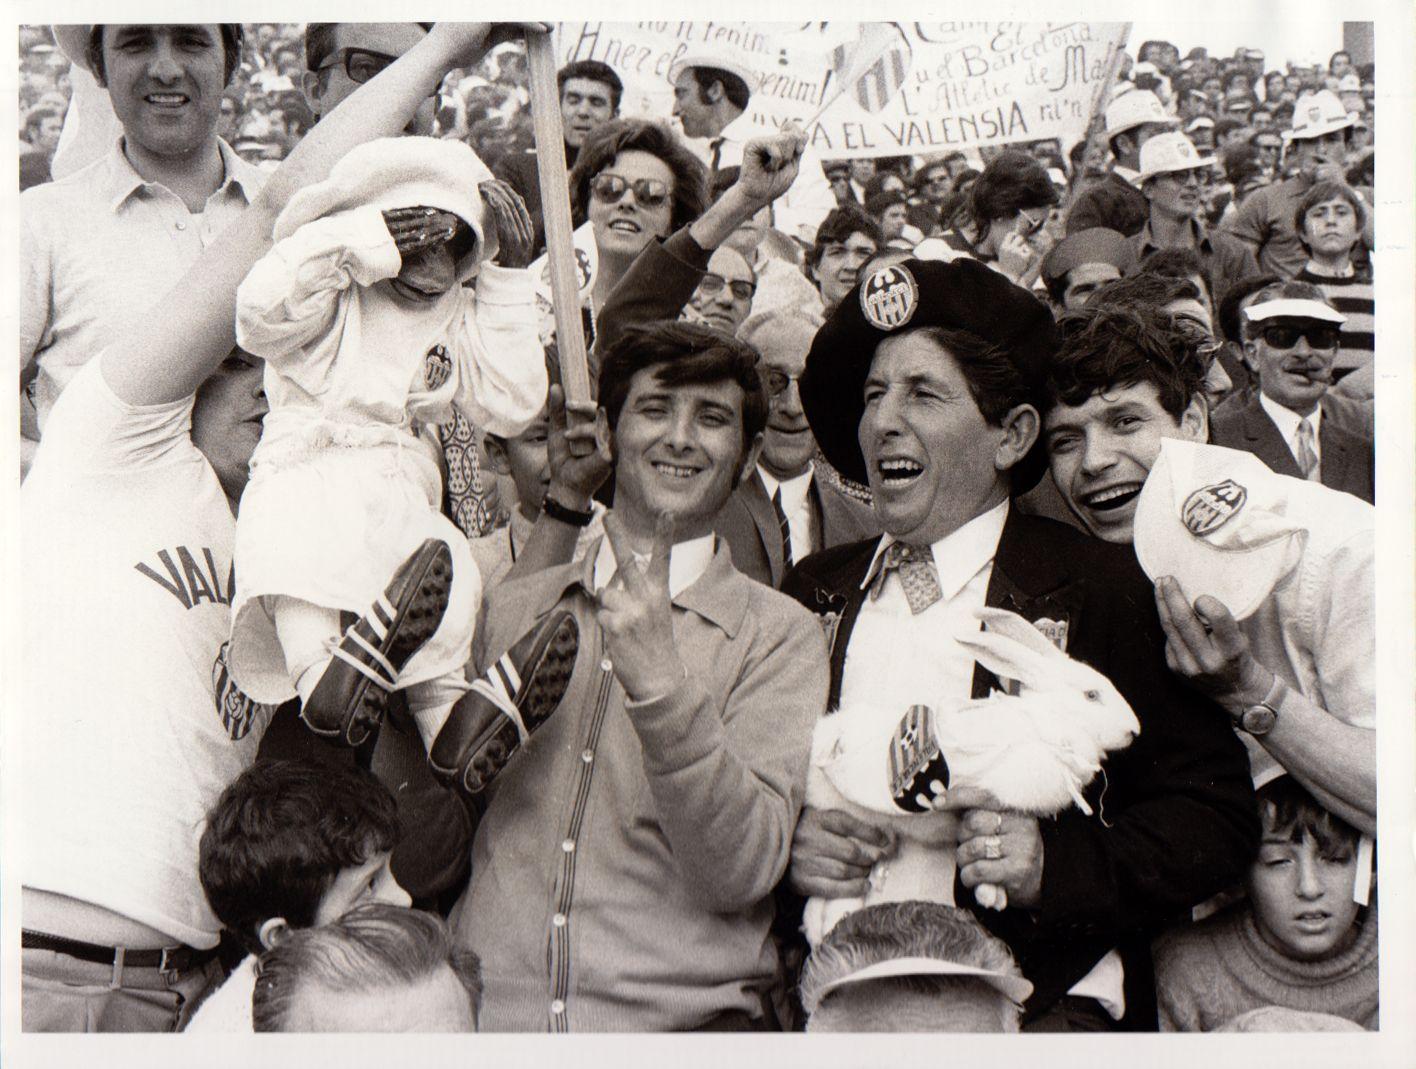 El álbum del 18 de abril de 1971 en Sarrià